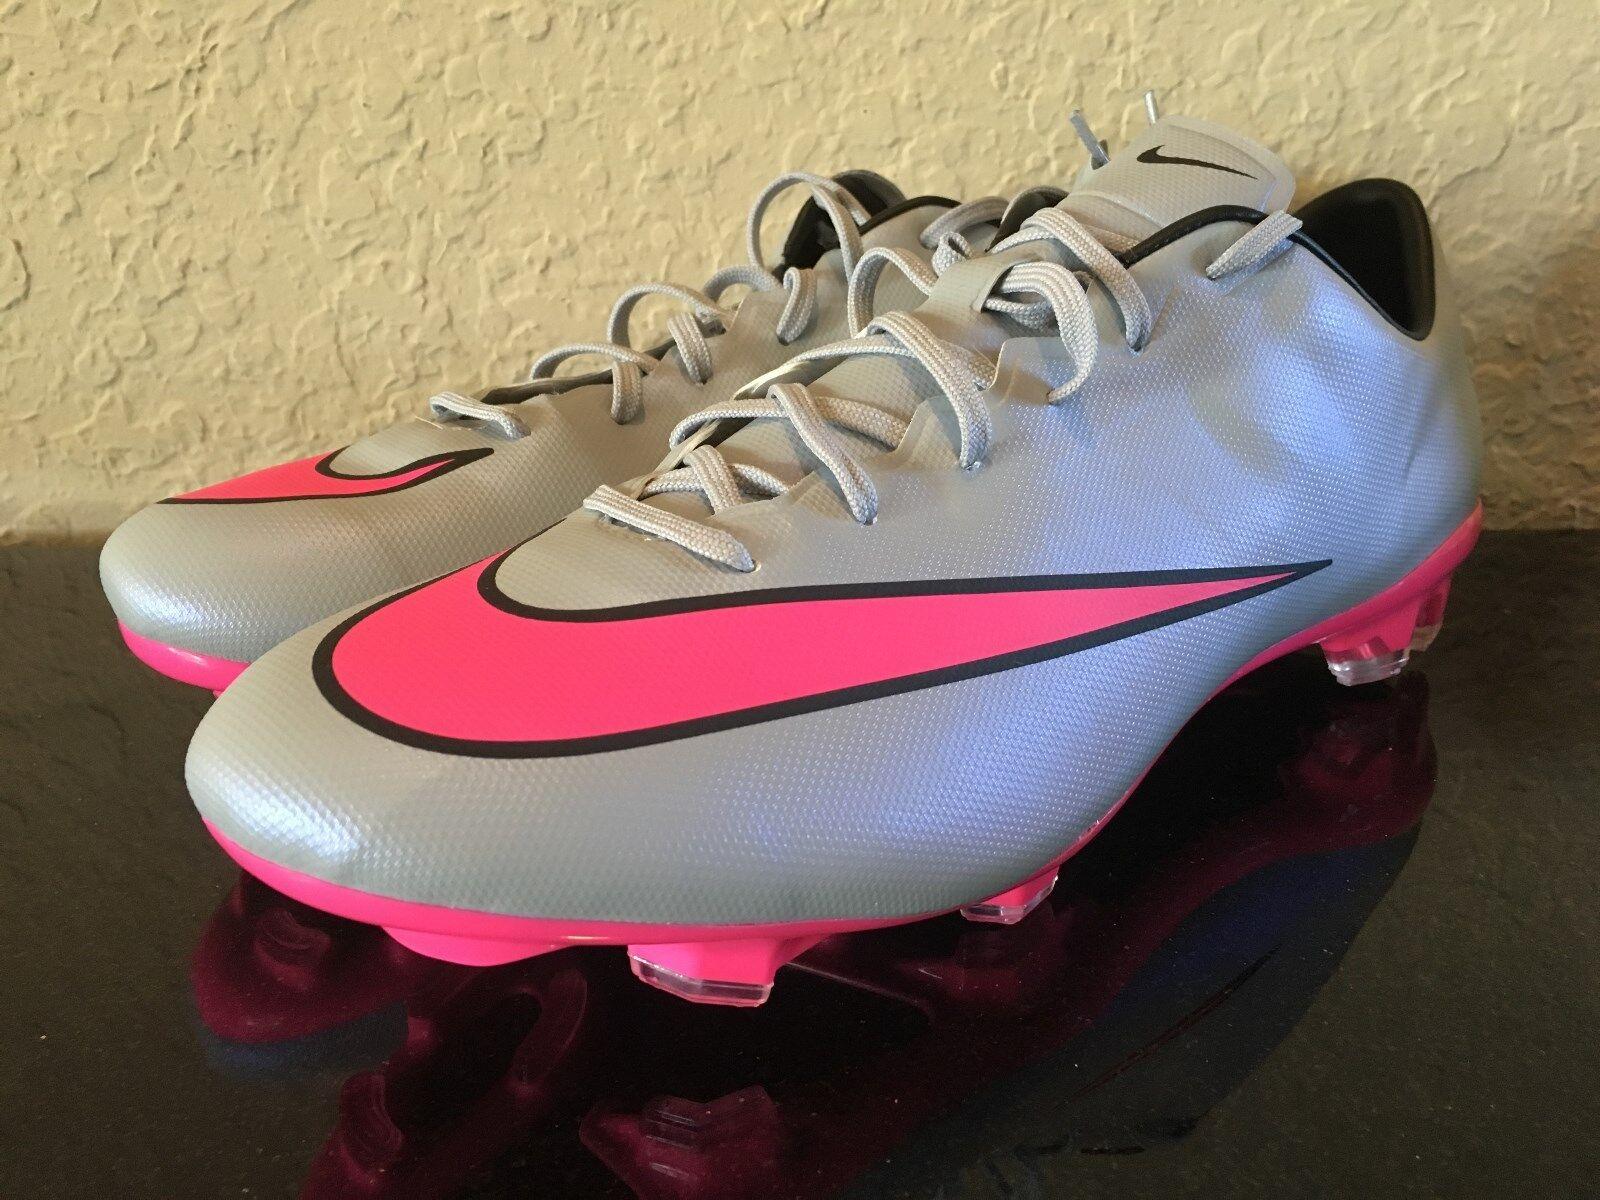 Nike Mercurial Soccer Veloce II 2 FG Soccer Mercurial Cleat Grey Pink 3c7a4b